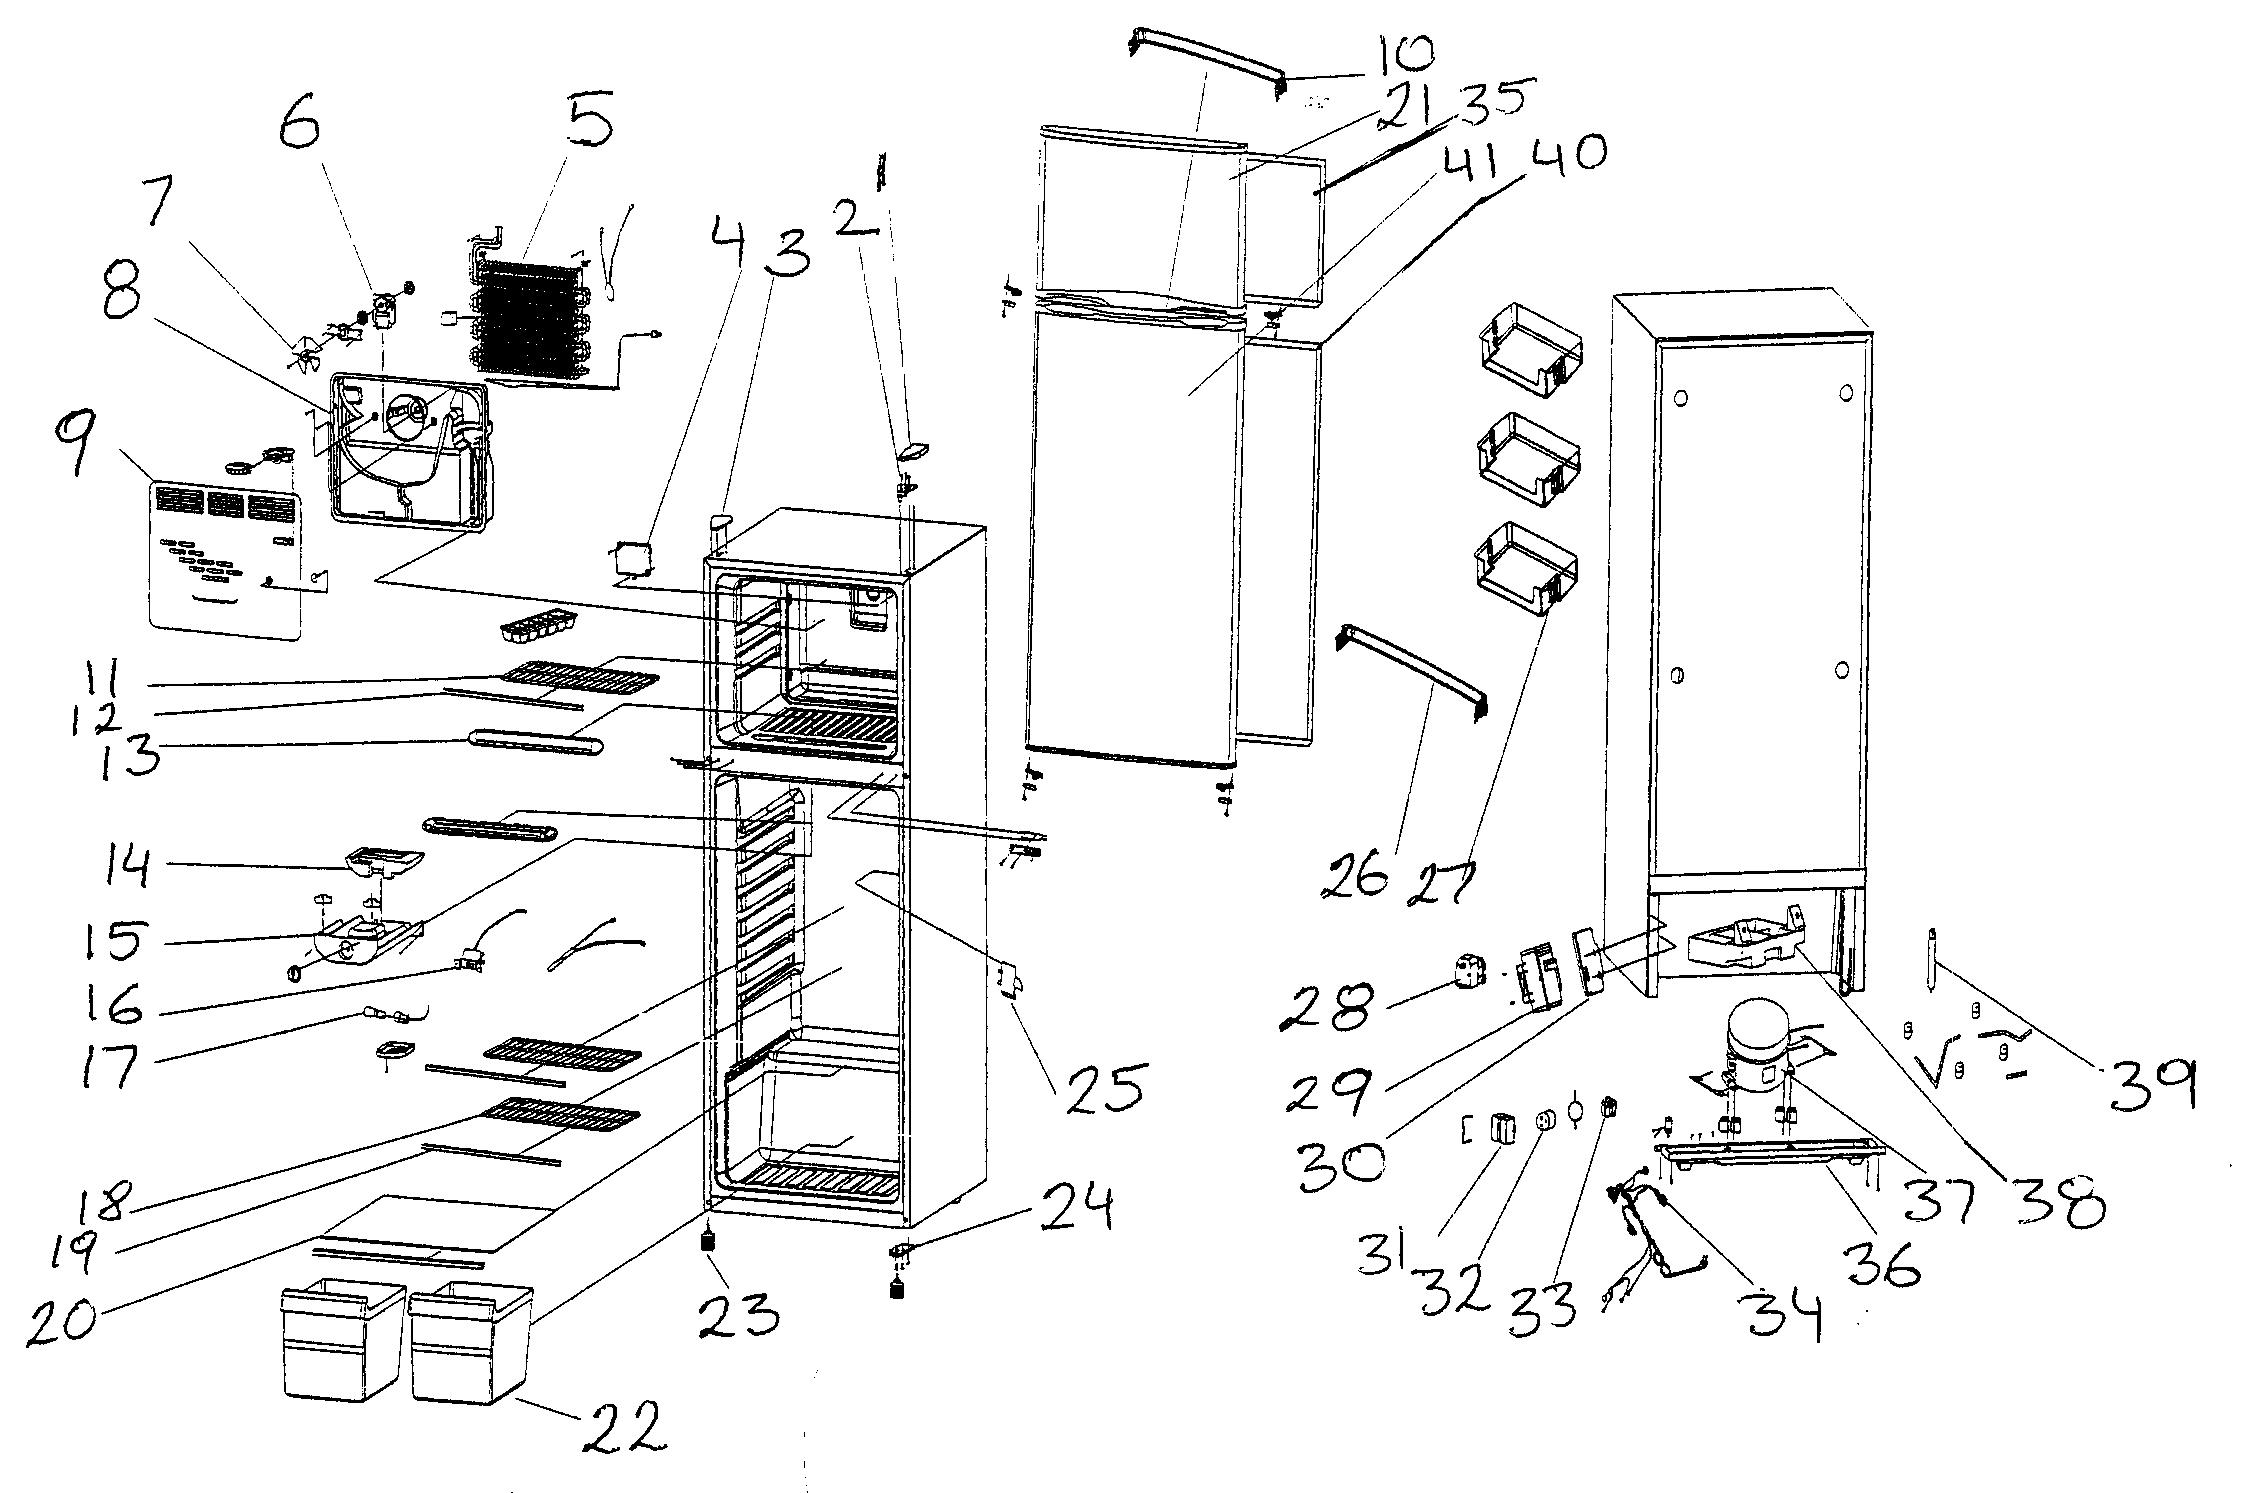 Magic Chef Fridge Wiring Diagram - Wiring Diagram Work on